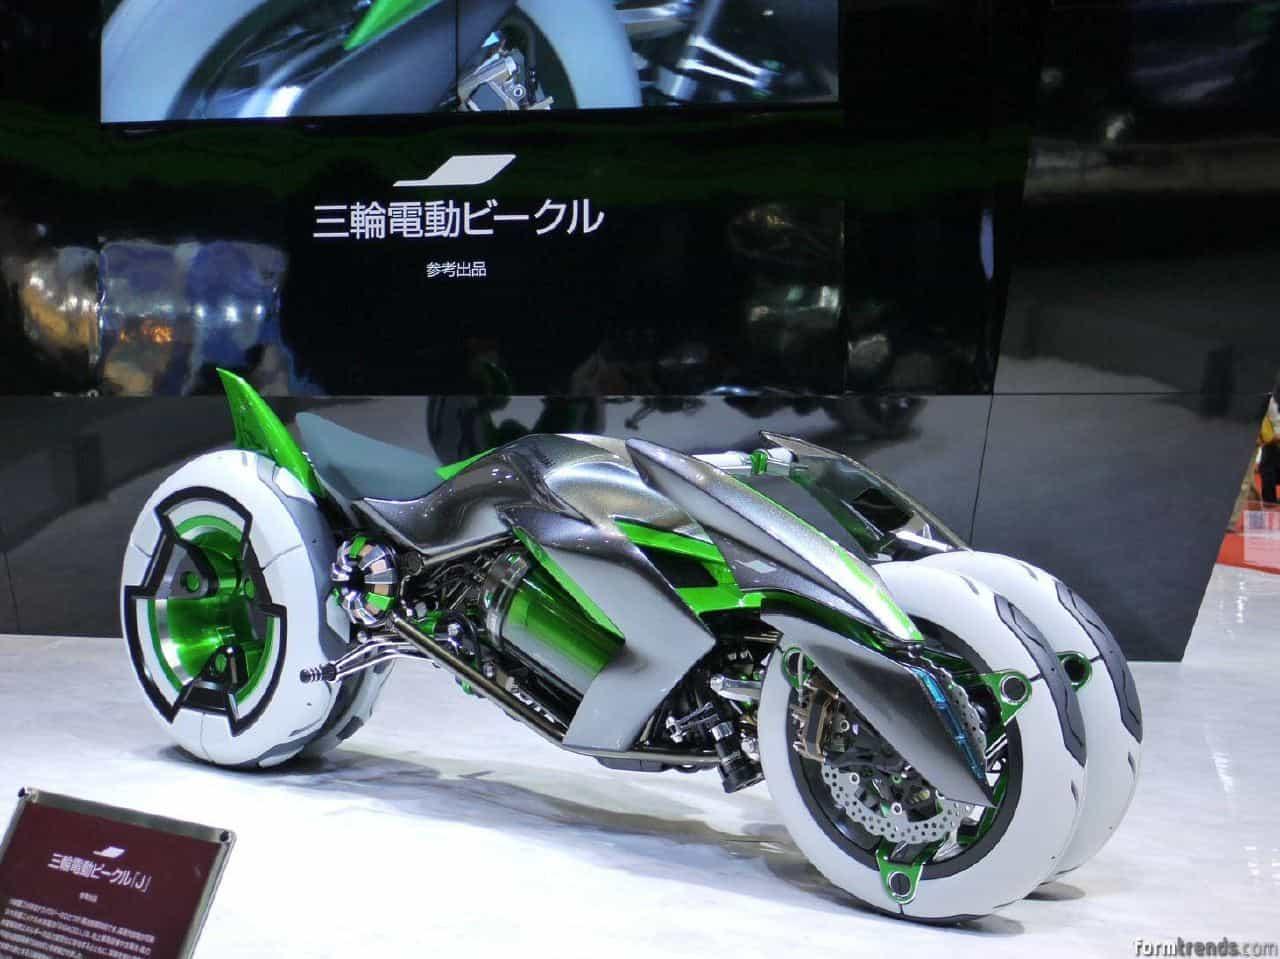 Kawasaki J Concept Rides Into Future